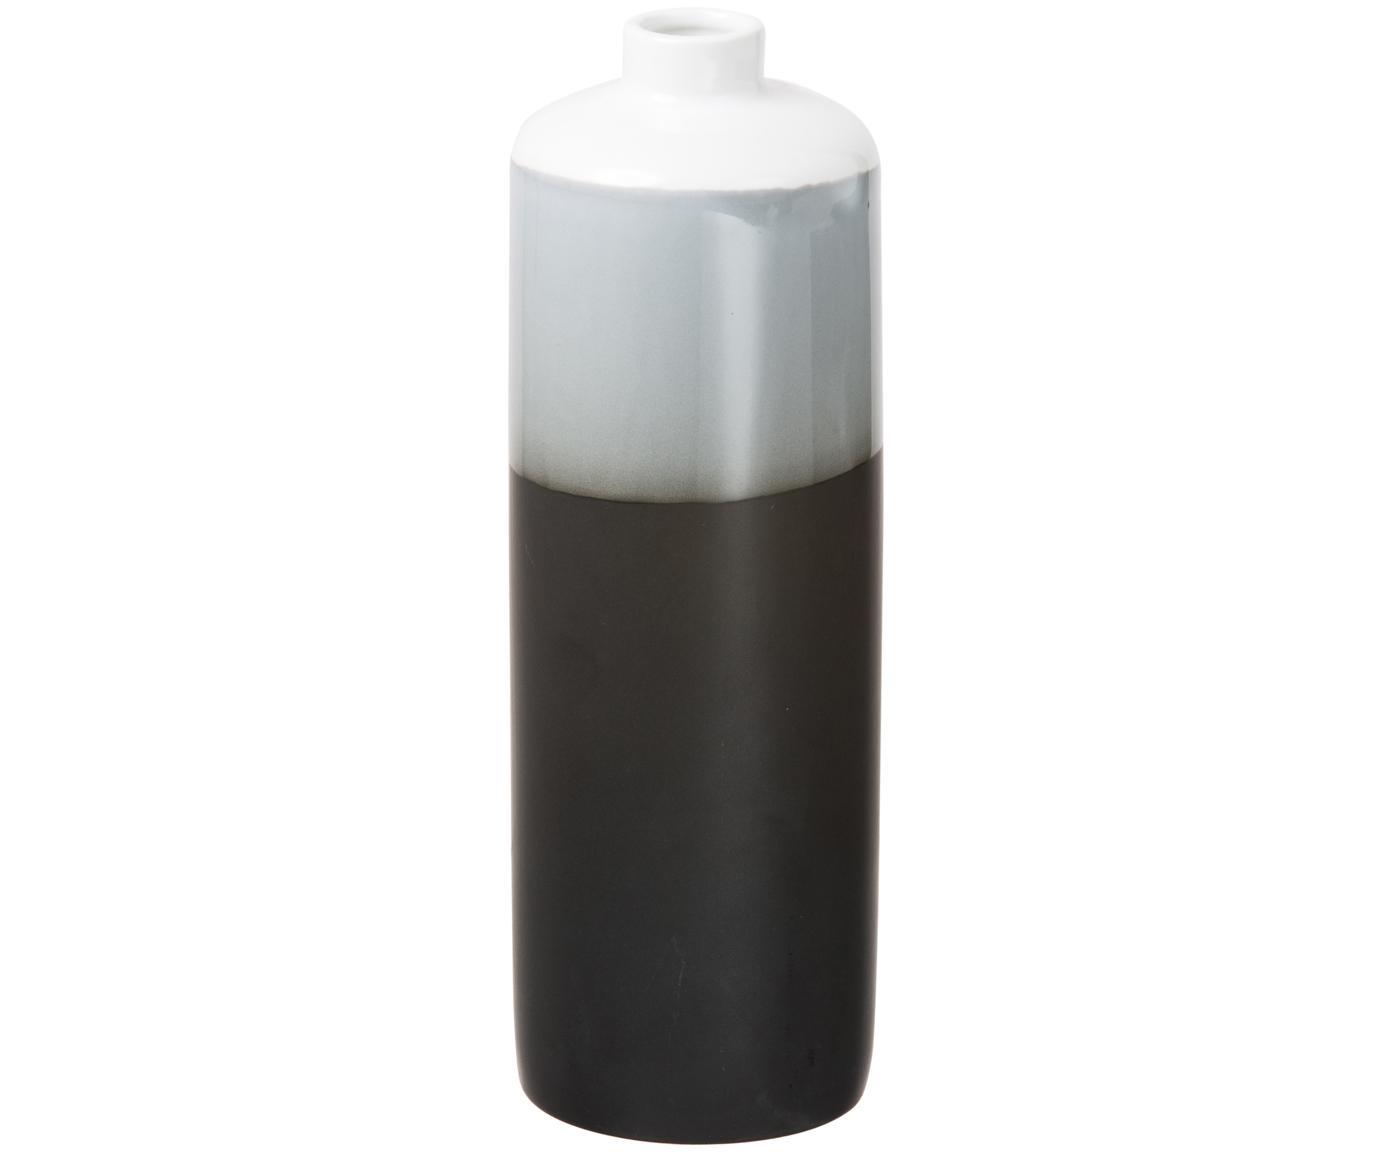 Vasen-Set Brixa aus Porzellan, 3-tlg., Porzellan, Schwarz, Grau, Weiß, matt, Sondergrößen